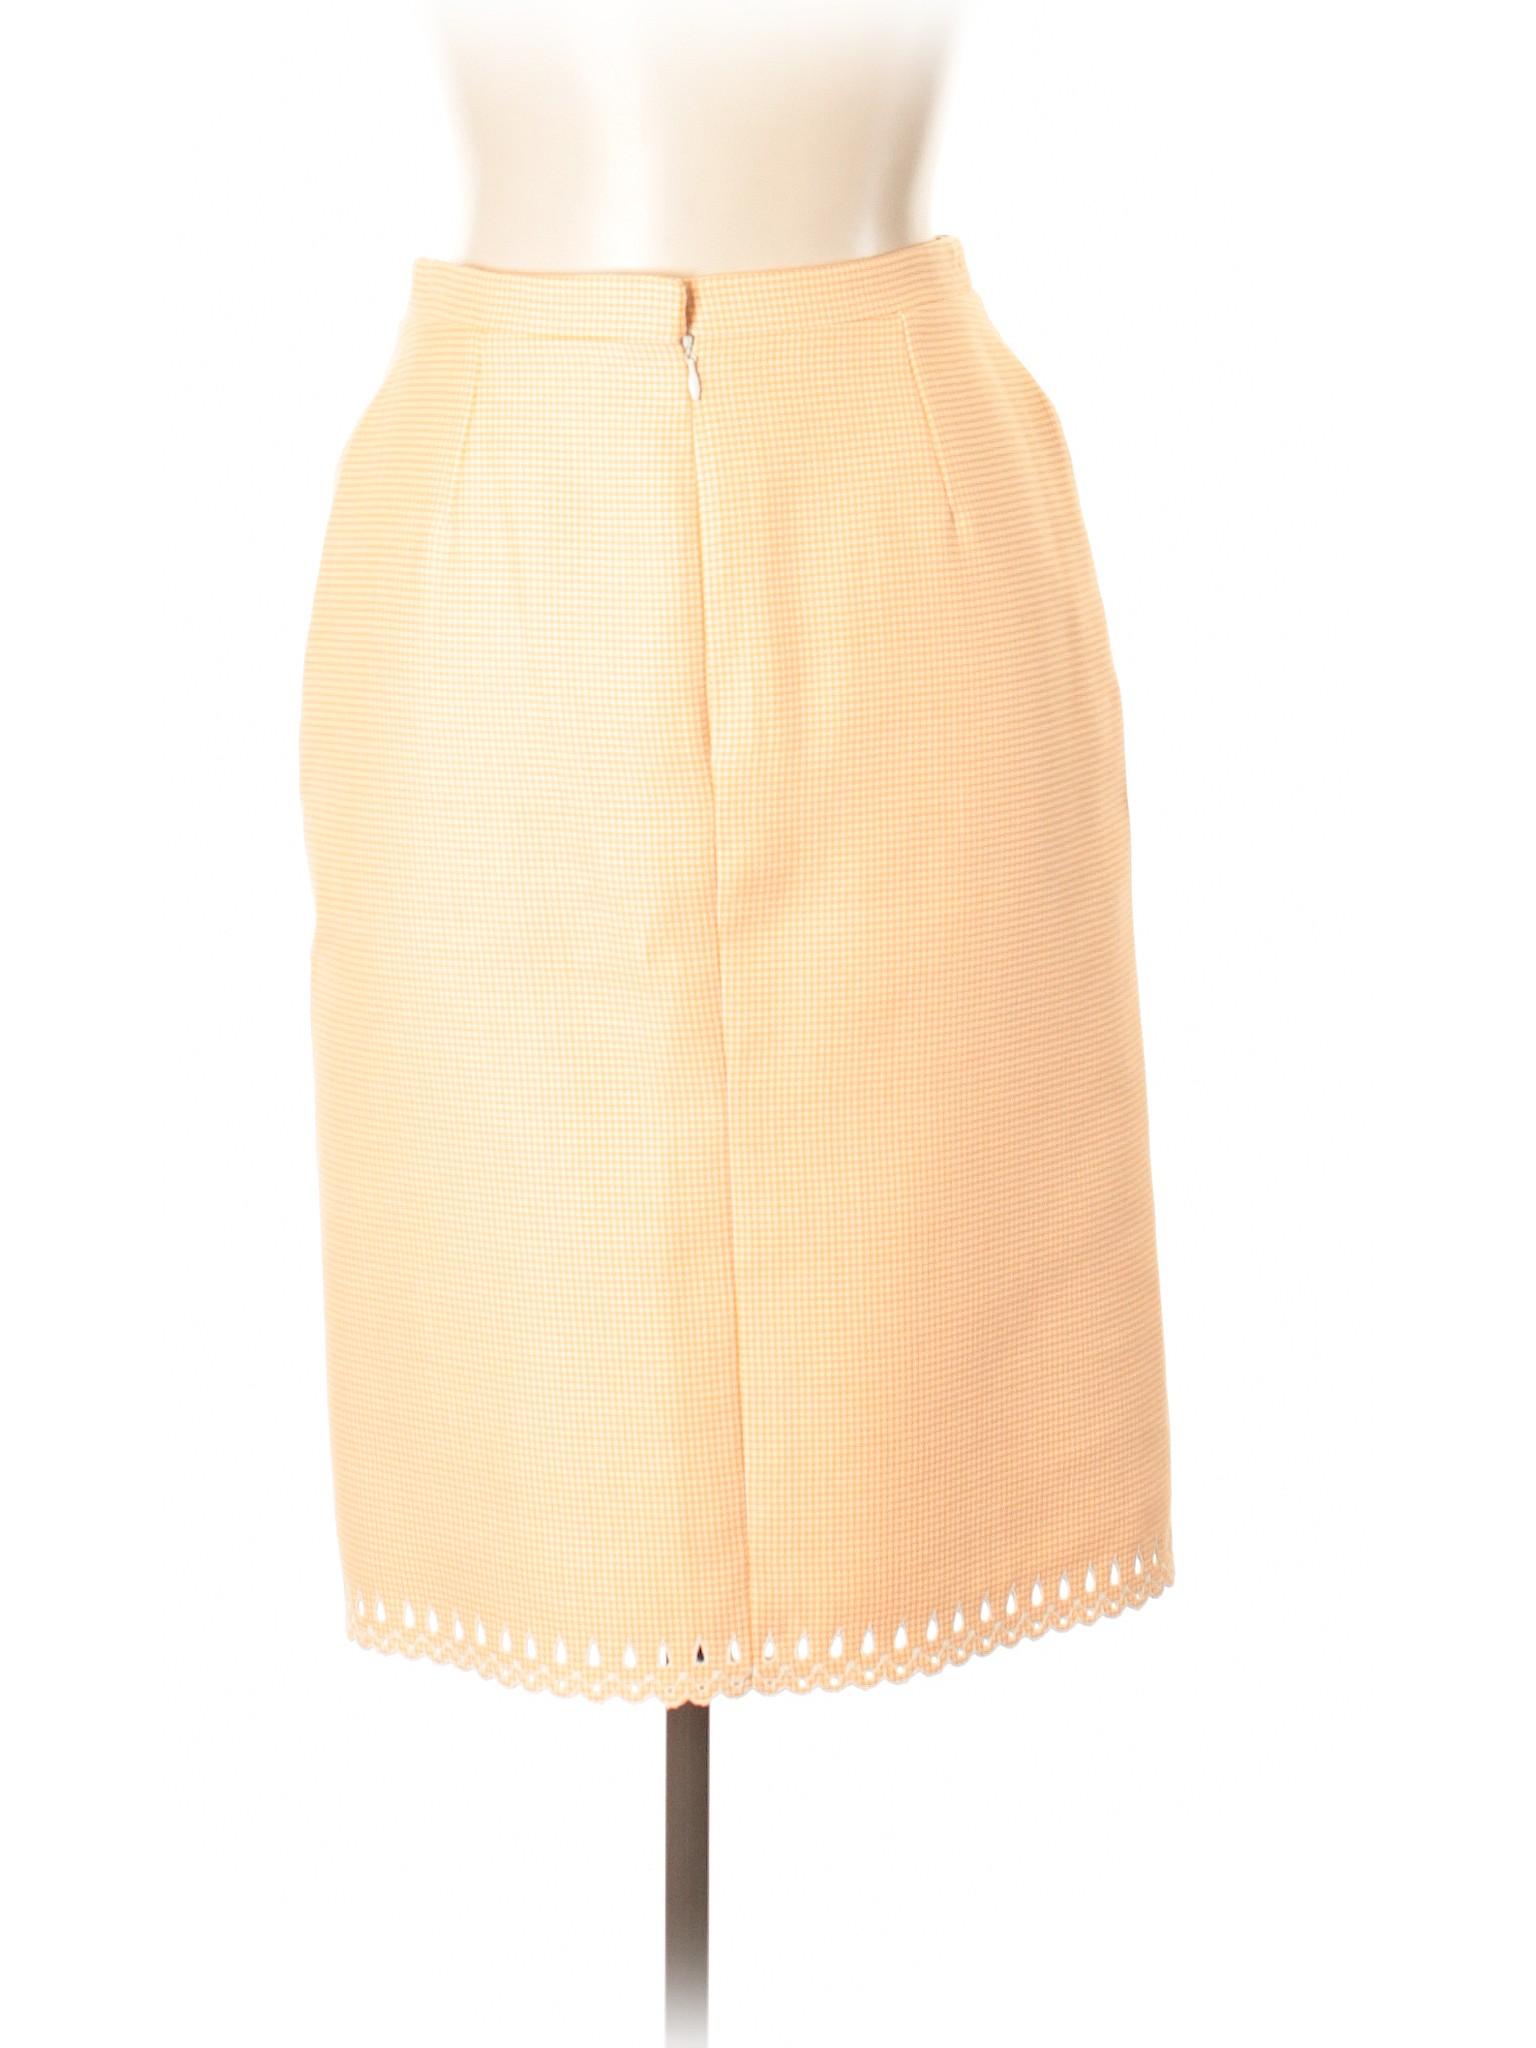 Boutique Boutique Wool Skirt Skirt Boutique Wool Wool Boutique Boutique Skirt Wool Skirt Wool UdgvfEwqv